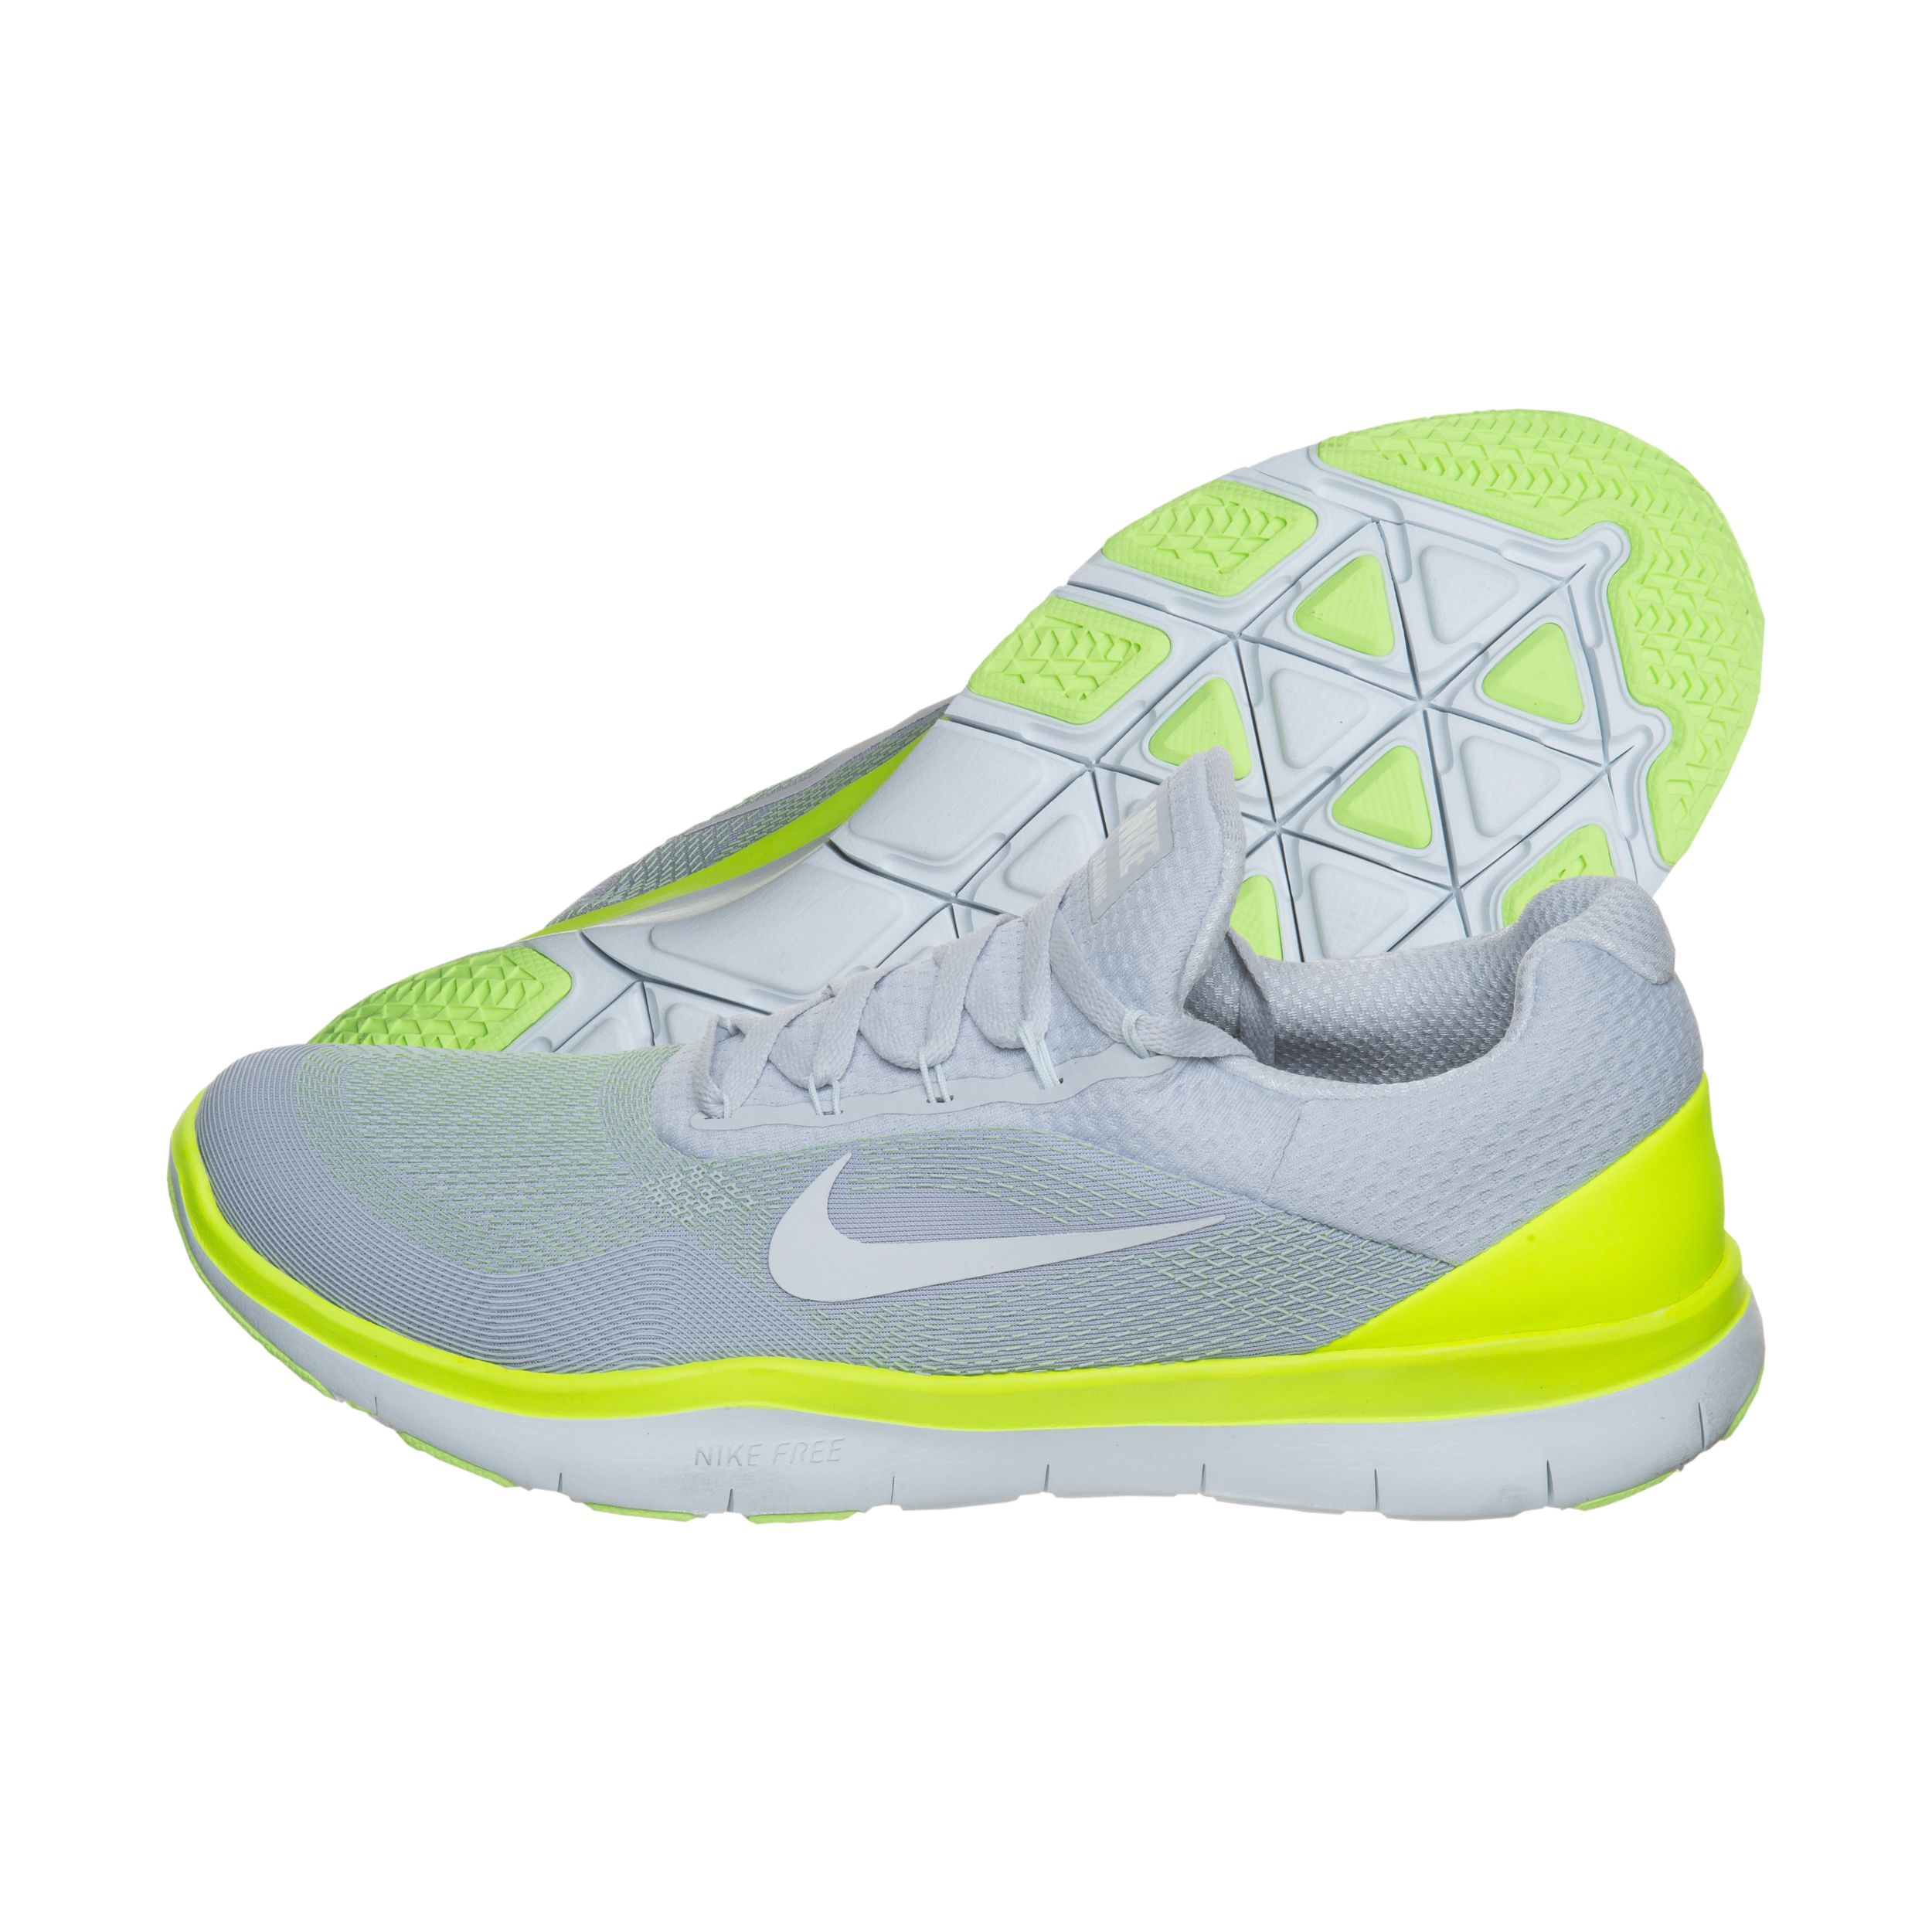 02ebc6d43b067 Teamsport Philipp | Nike Free Trainer v7 Training 898053-002 ...